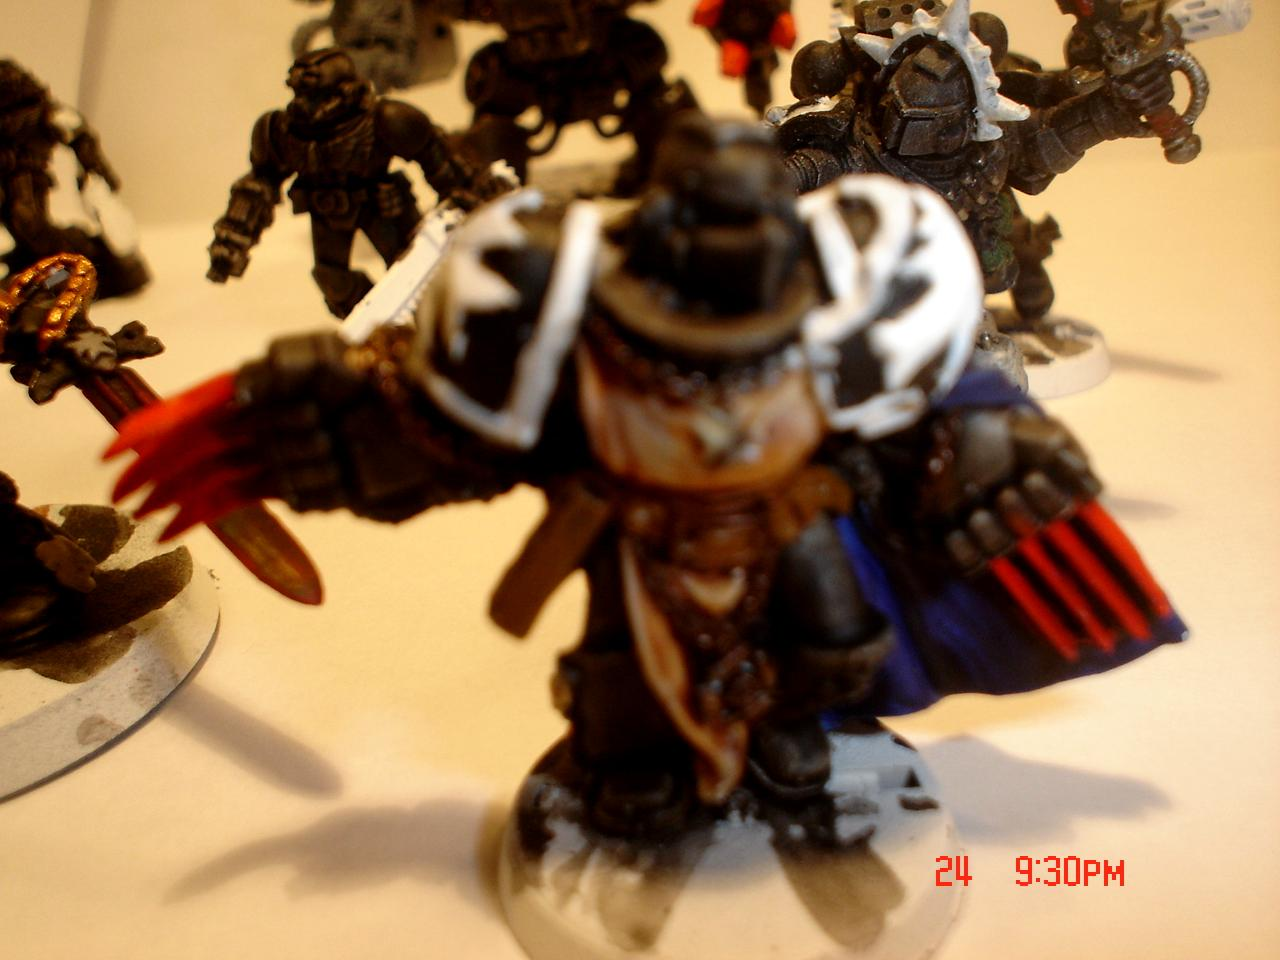 Black Templars, Blurred Photo, Lightning Claws